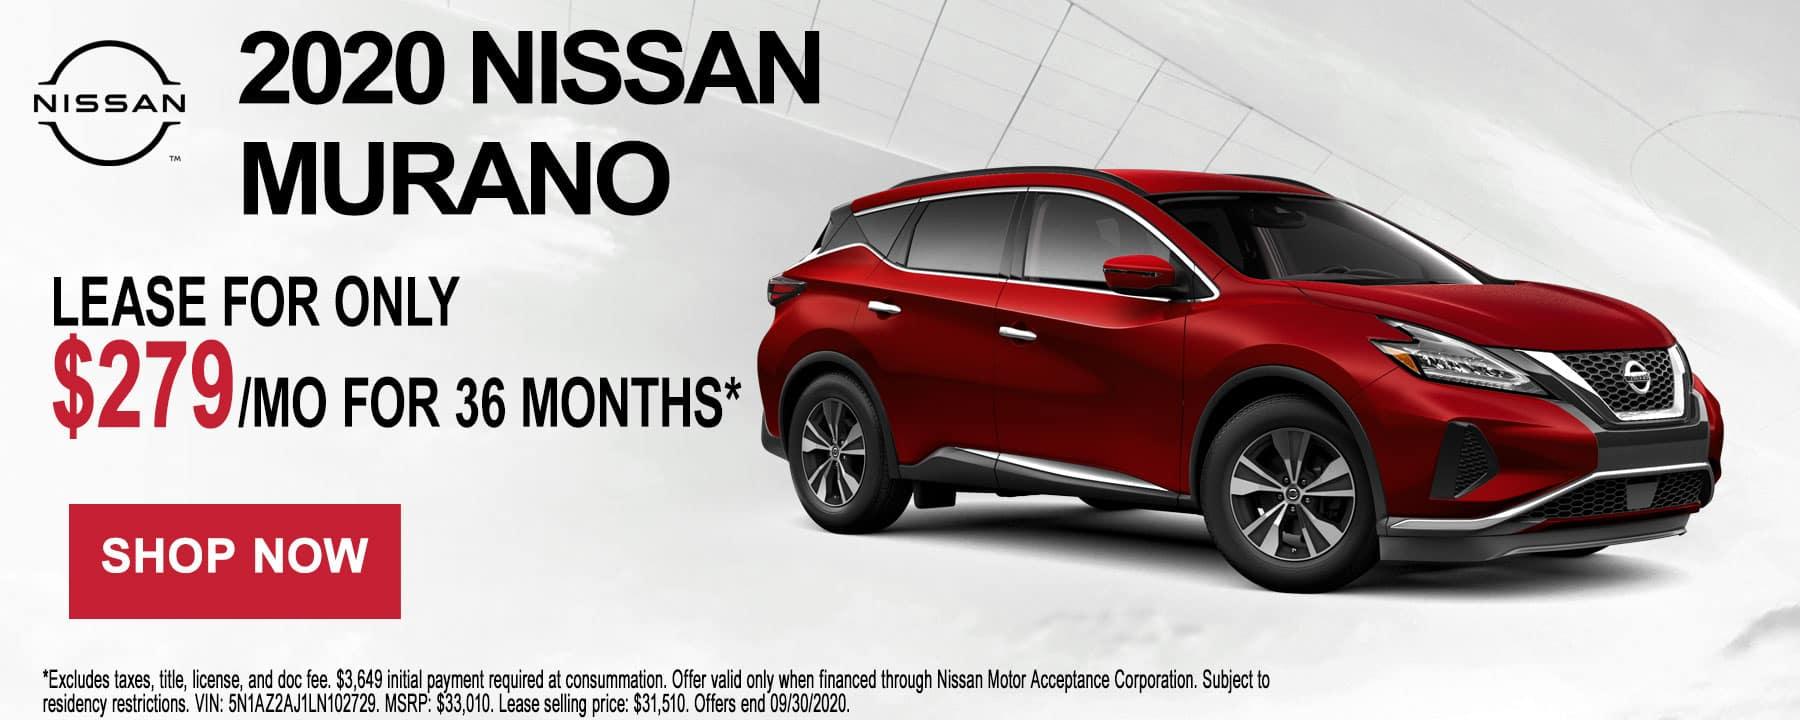 2020 Nissan Murano September Lease Offer at Star Nissan